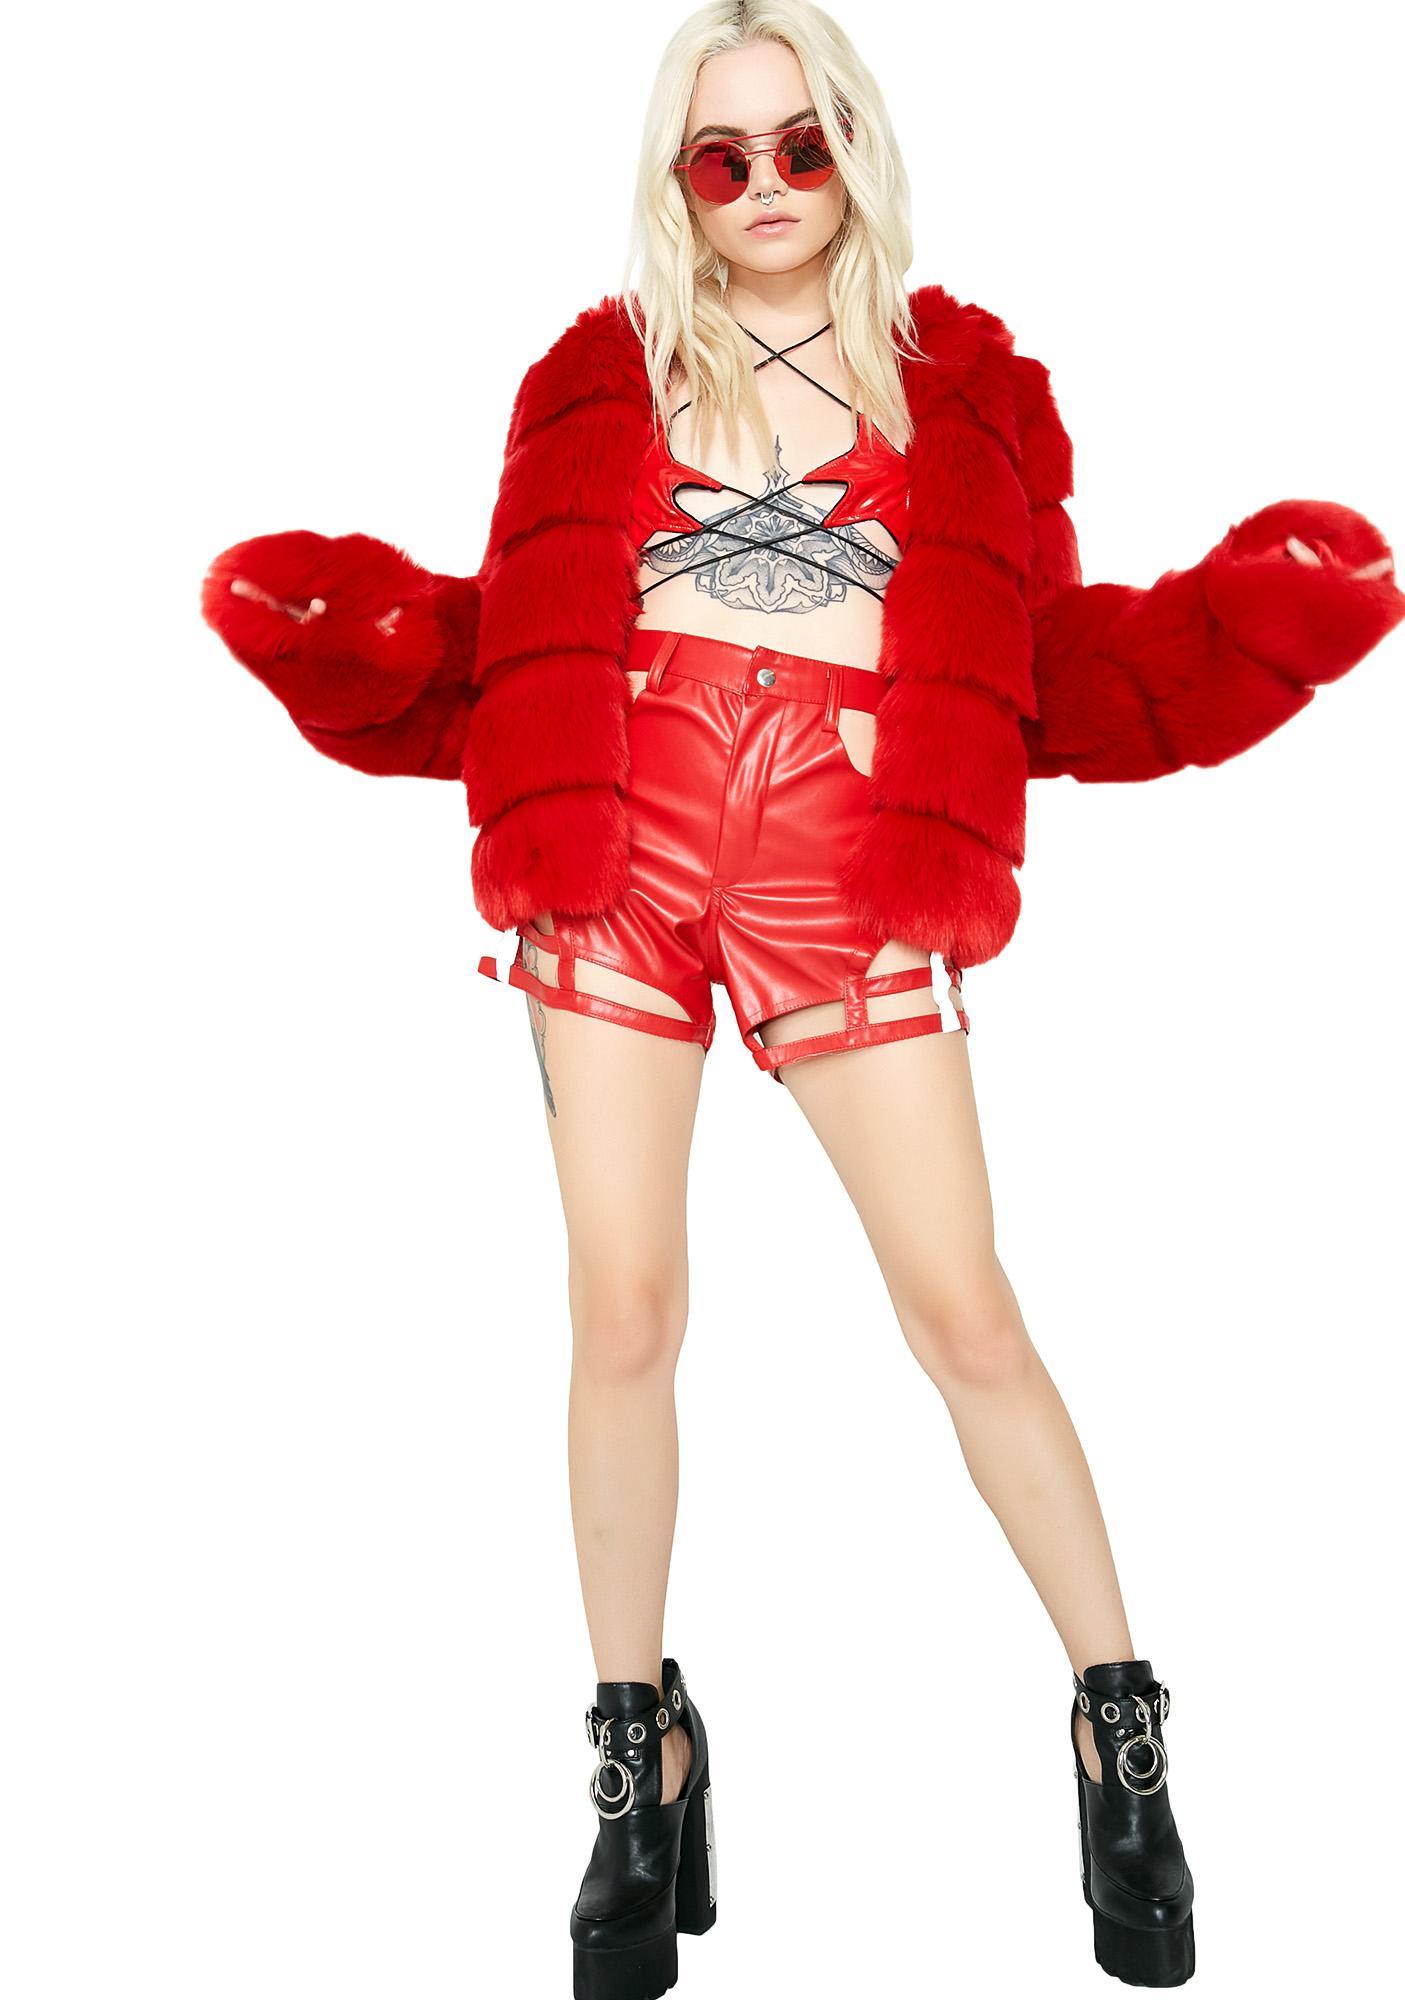 ESQAPE Motlii Red Shorts